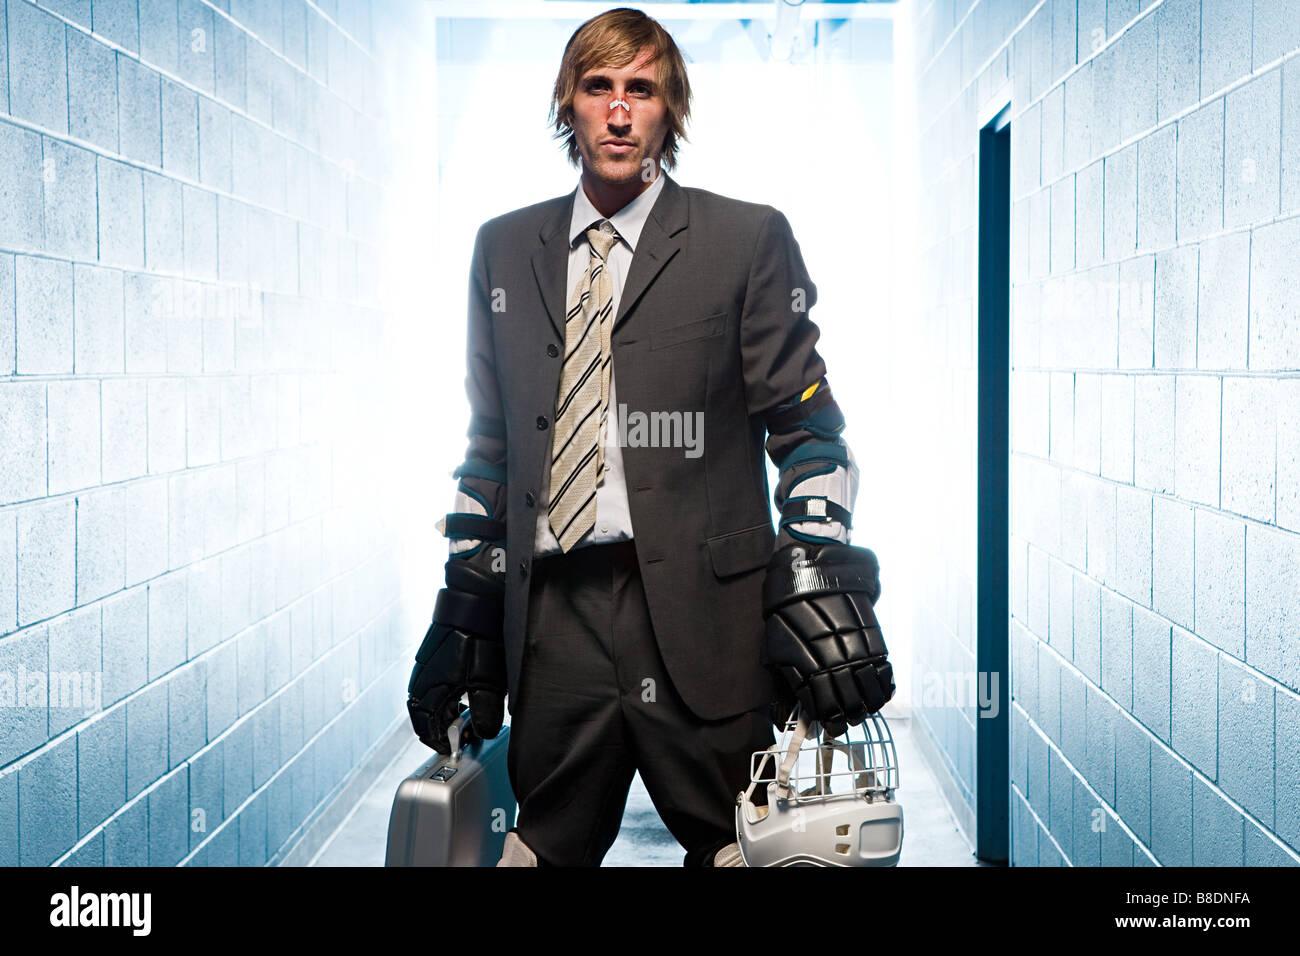 Businessman with an ice hockey uniform - Stock Image